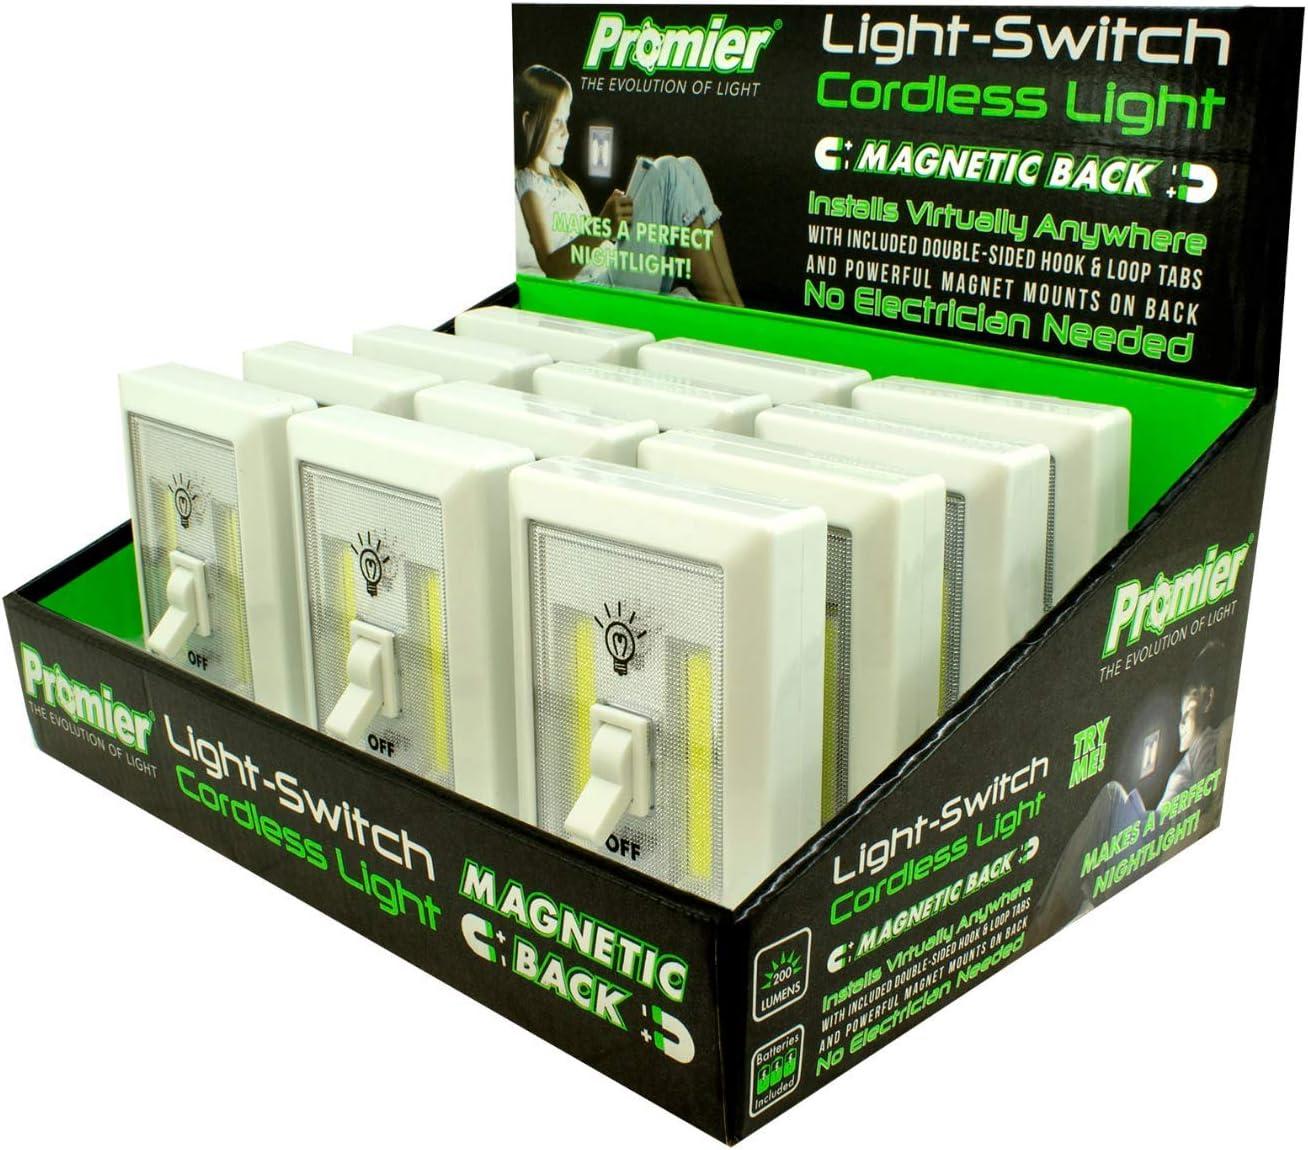 LITEZALL WIRELESS LIGHT SWITCH ~ NEW IN PACK